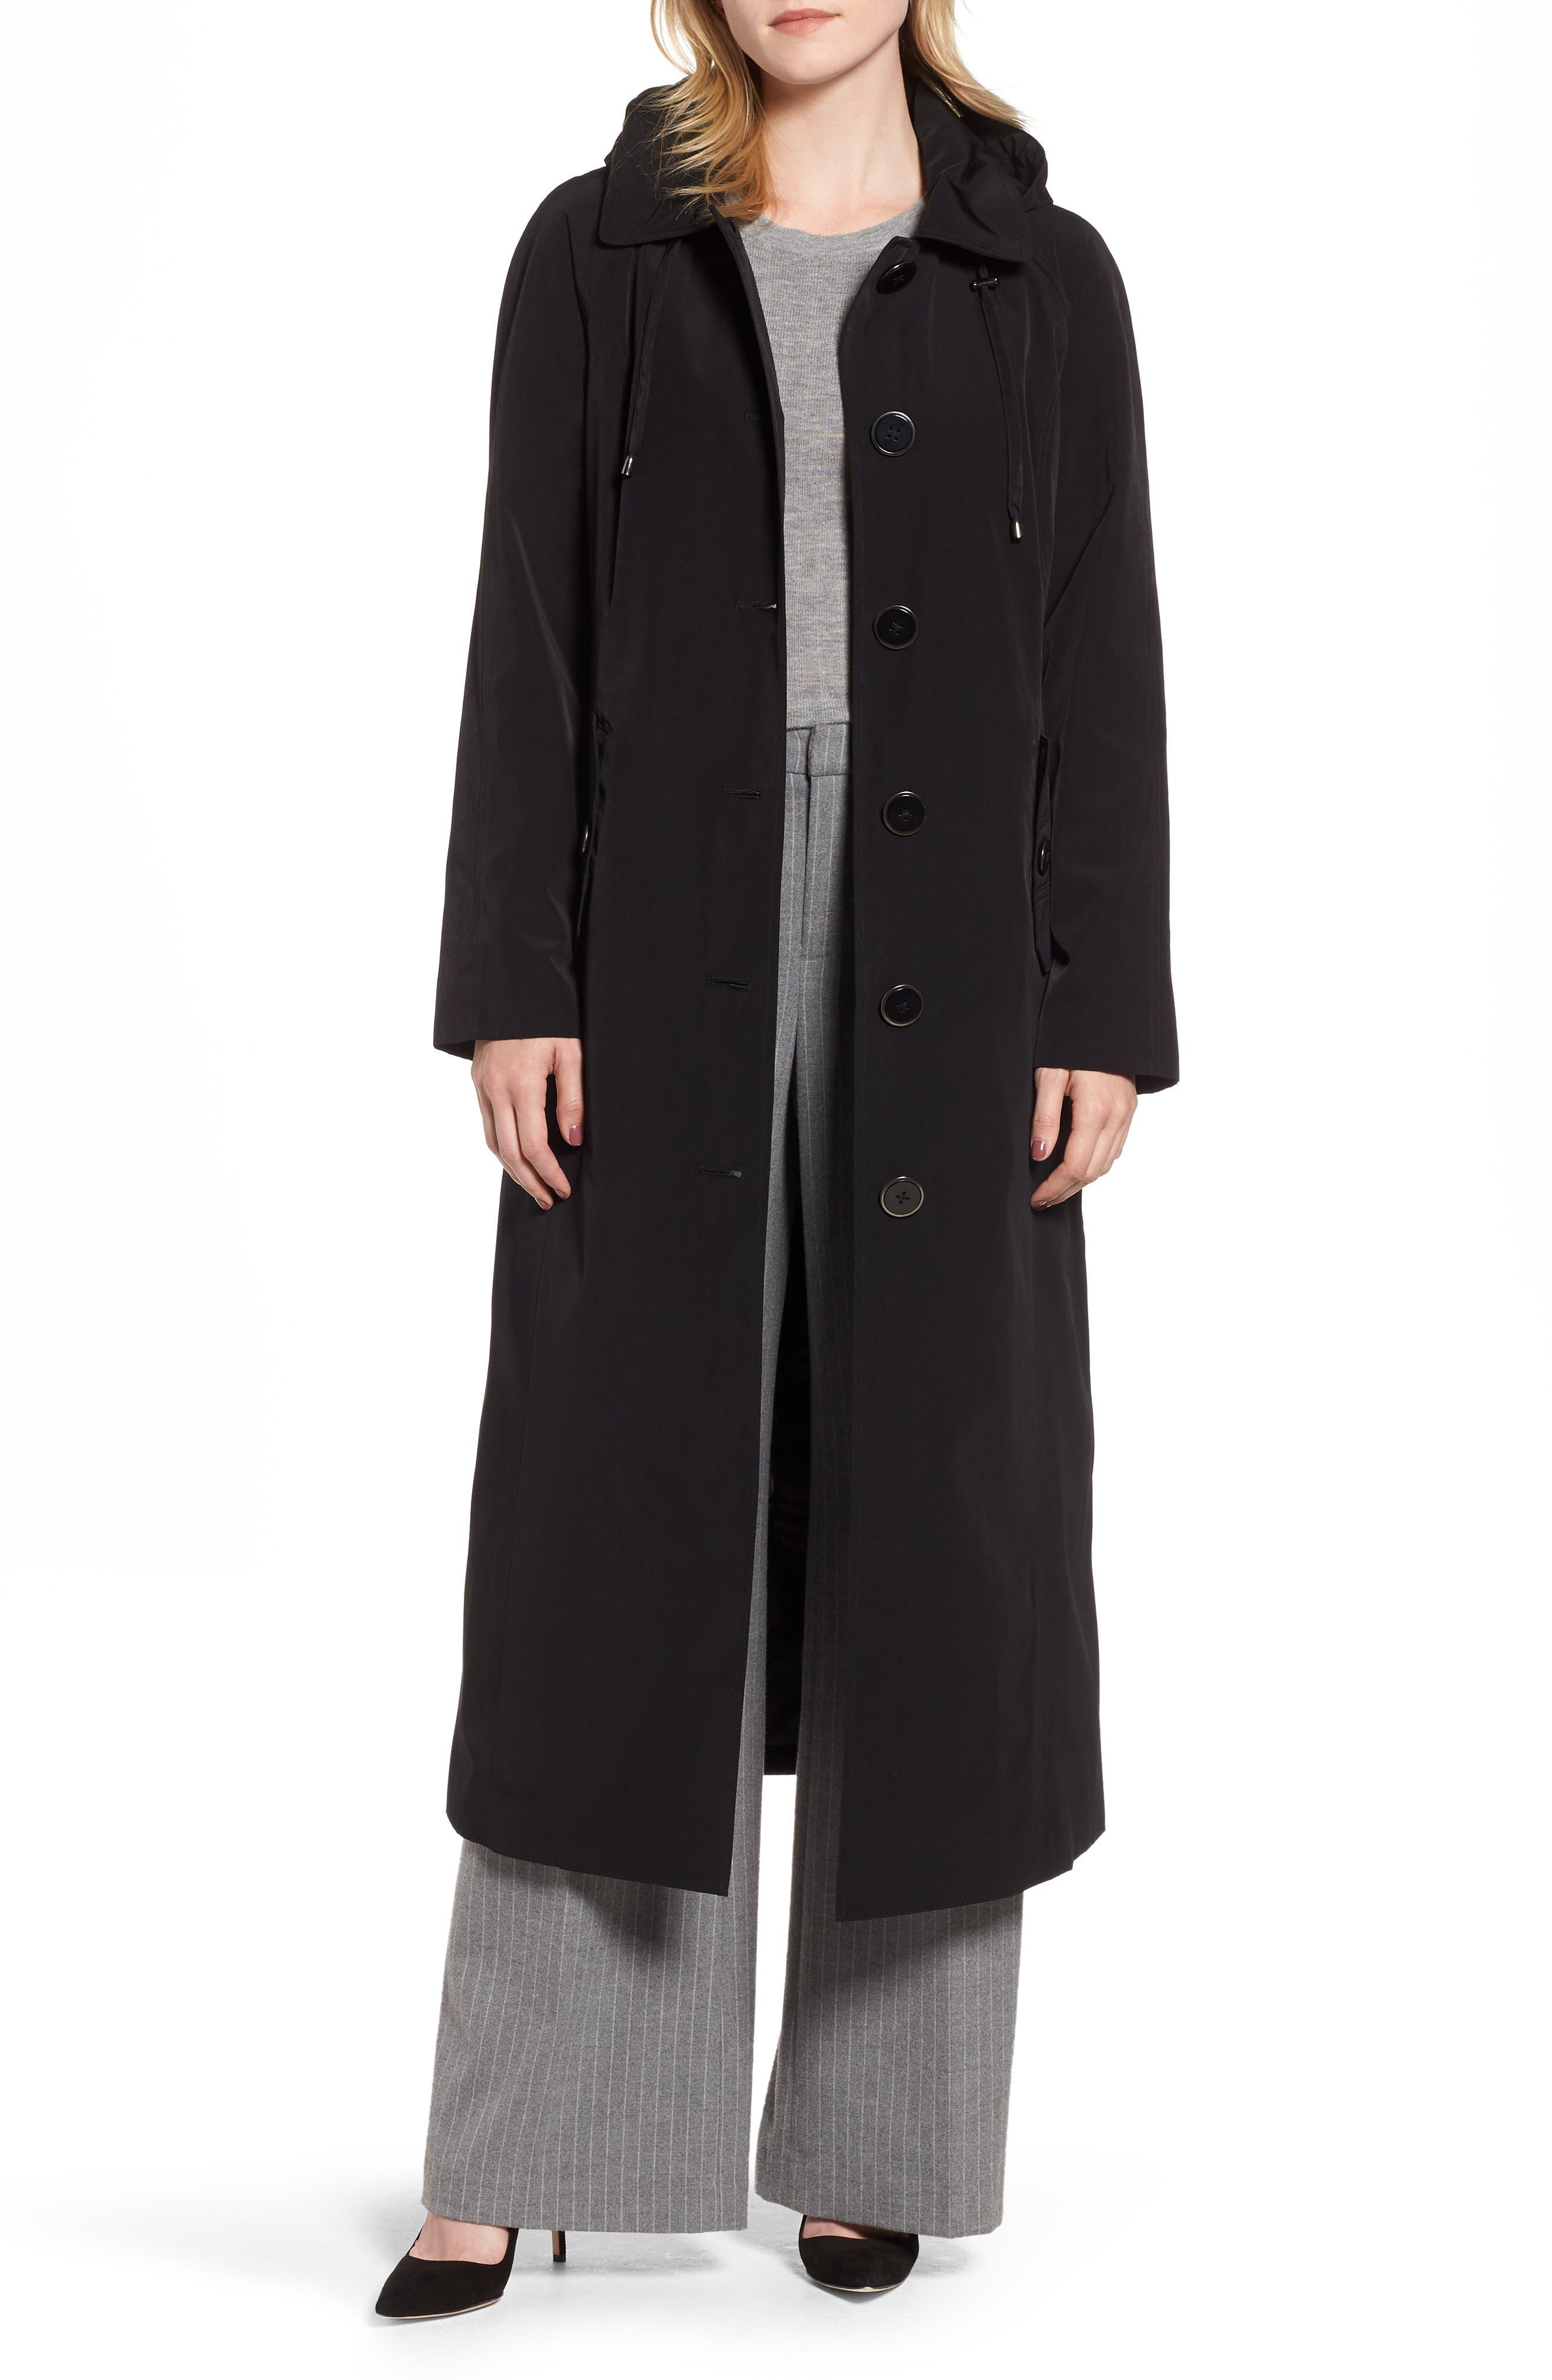 LONDON FOG, Long Trench Coat with Detachable Hood & Liner, Alternate thumbnail 5, color, BLACK